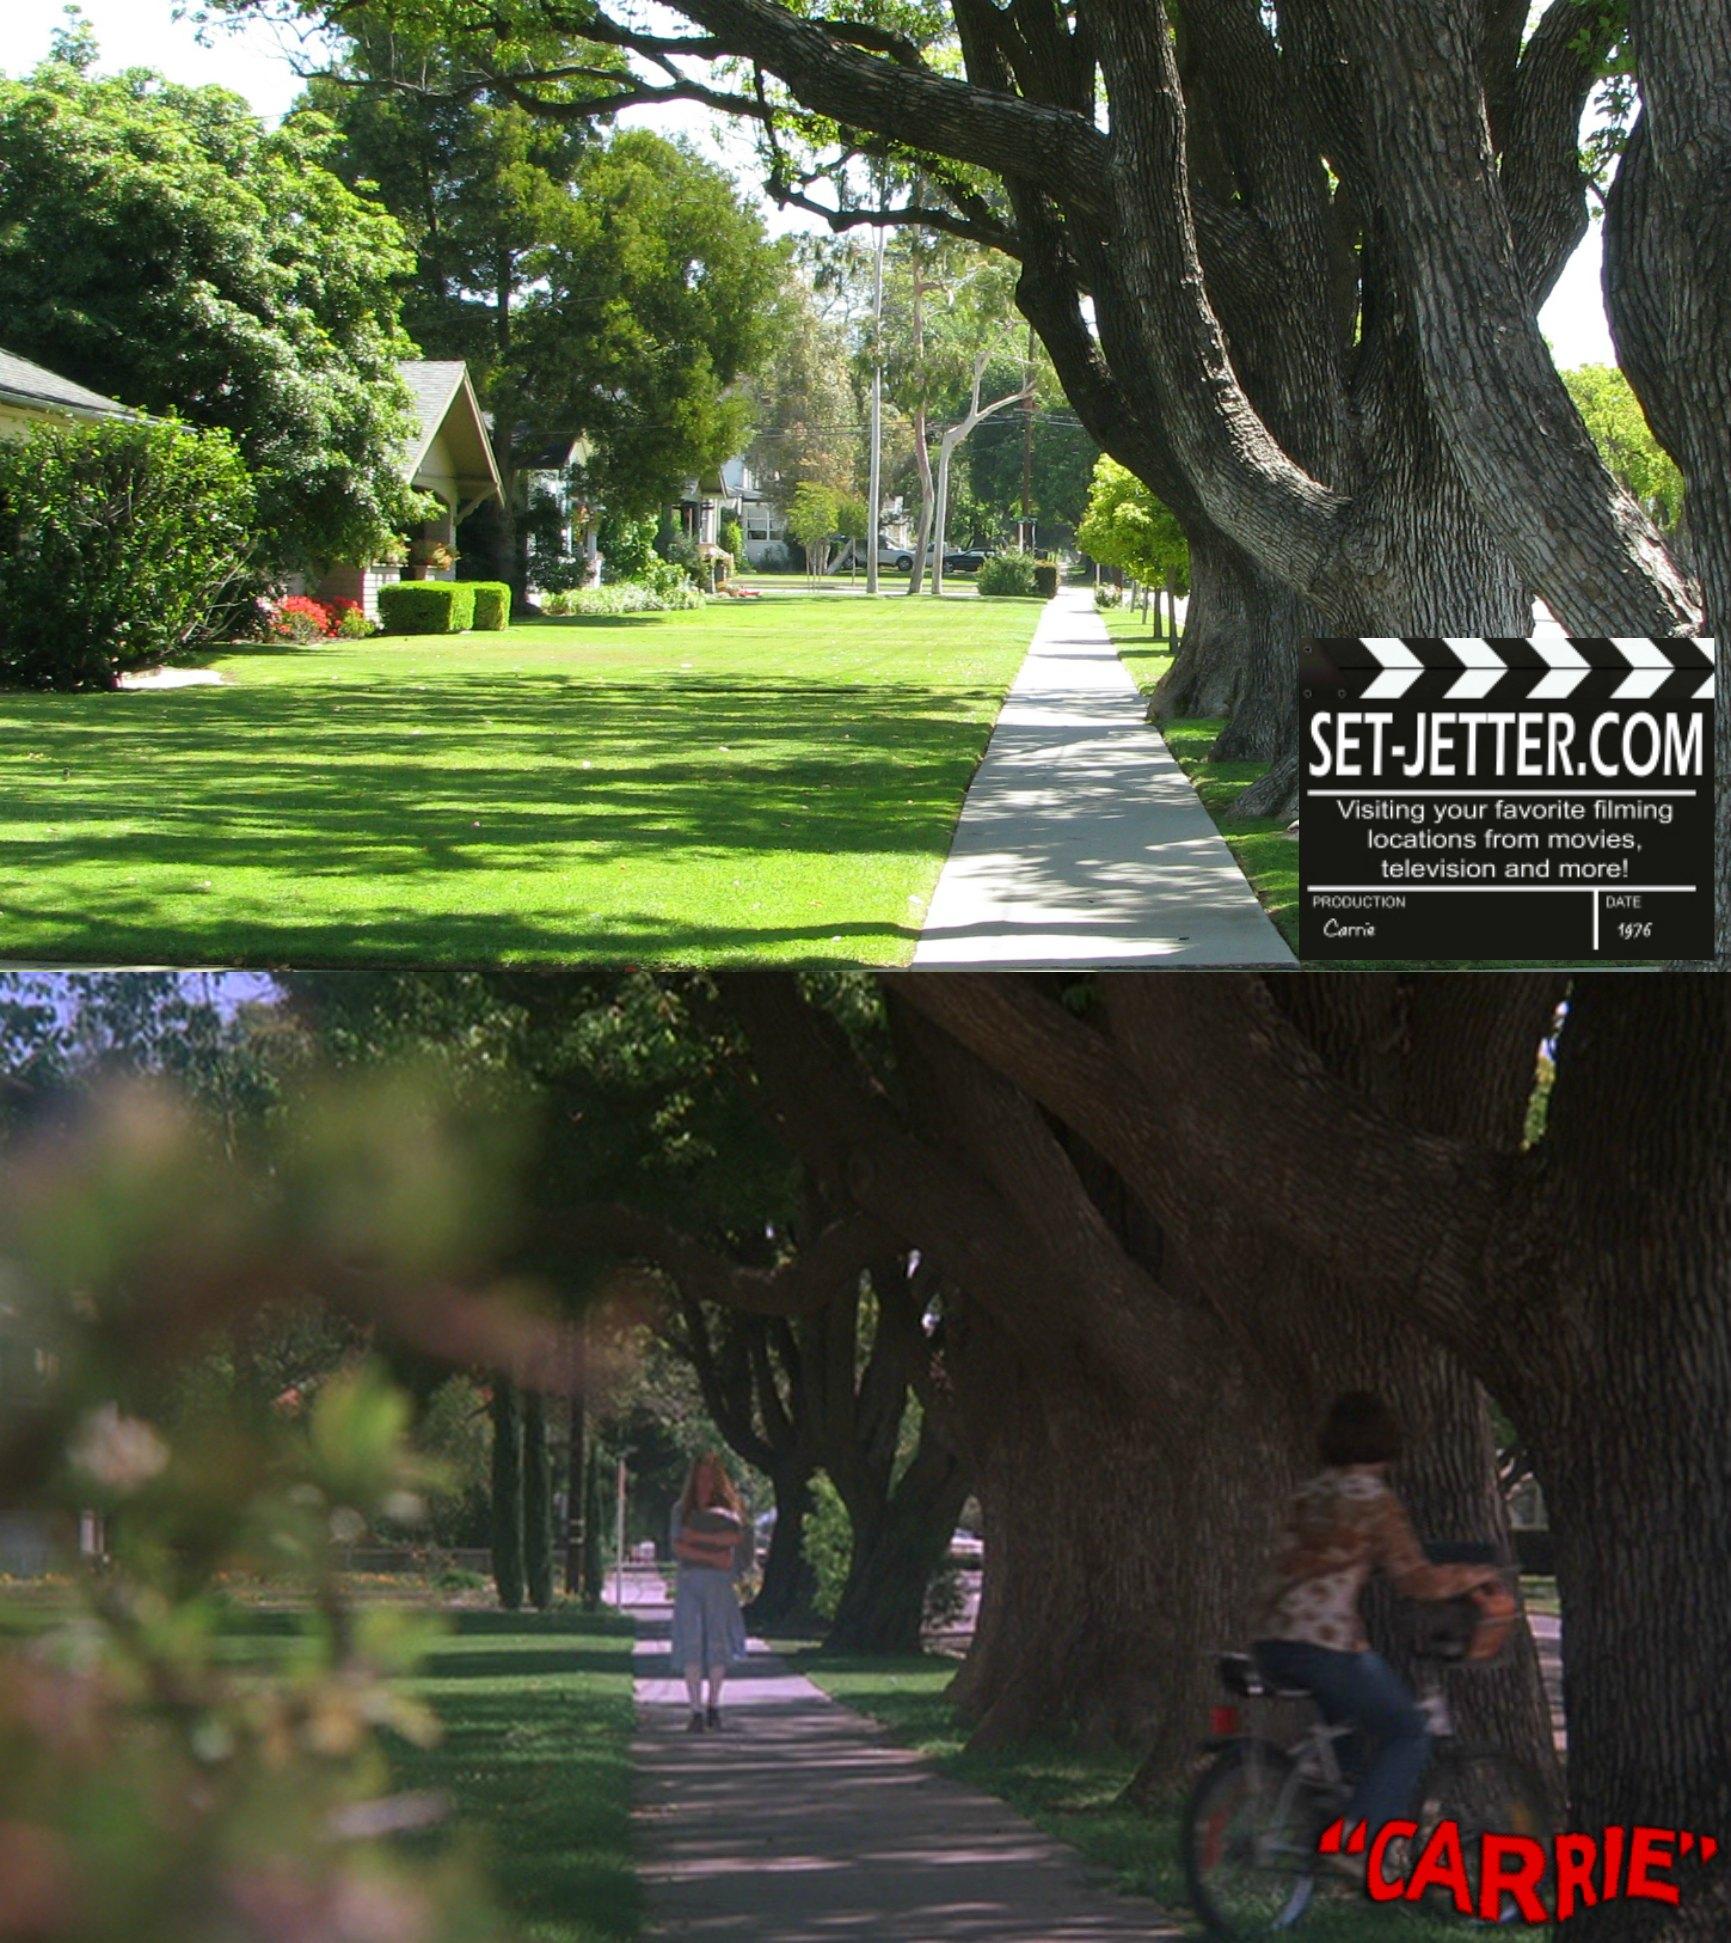 Carrie trees 01.jpg